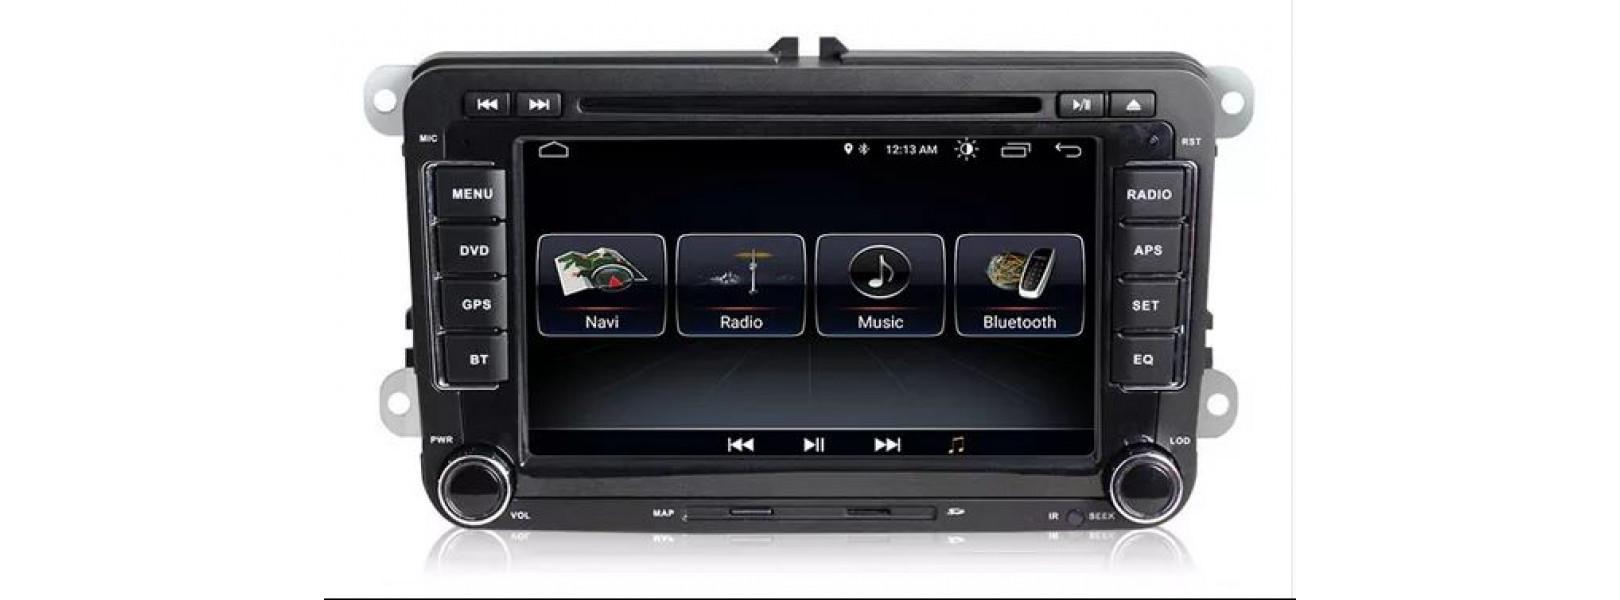 Volkswagen и Skoda RNS 510 - Навигация Андроид 10.1 Мултимедия